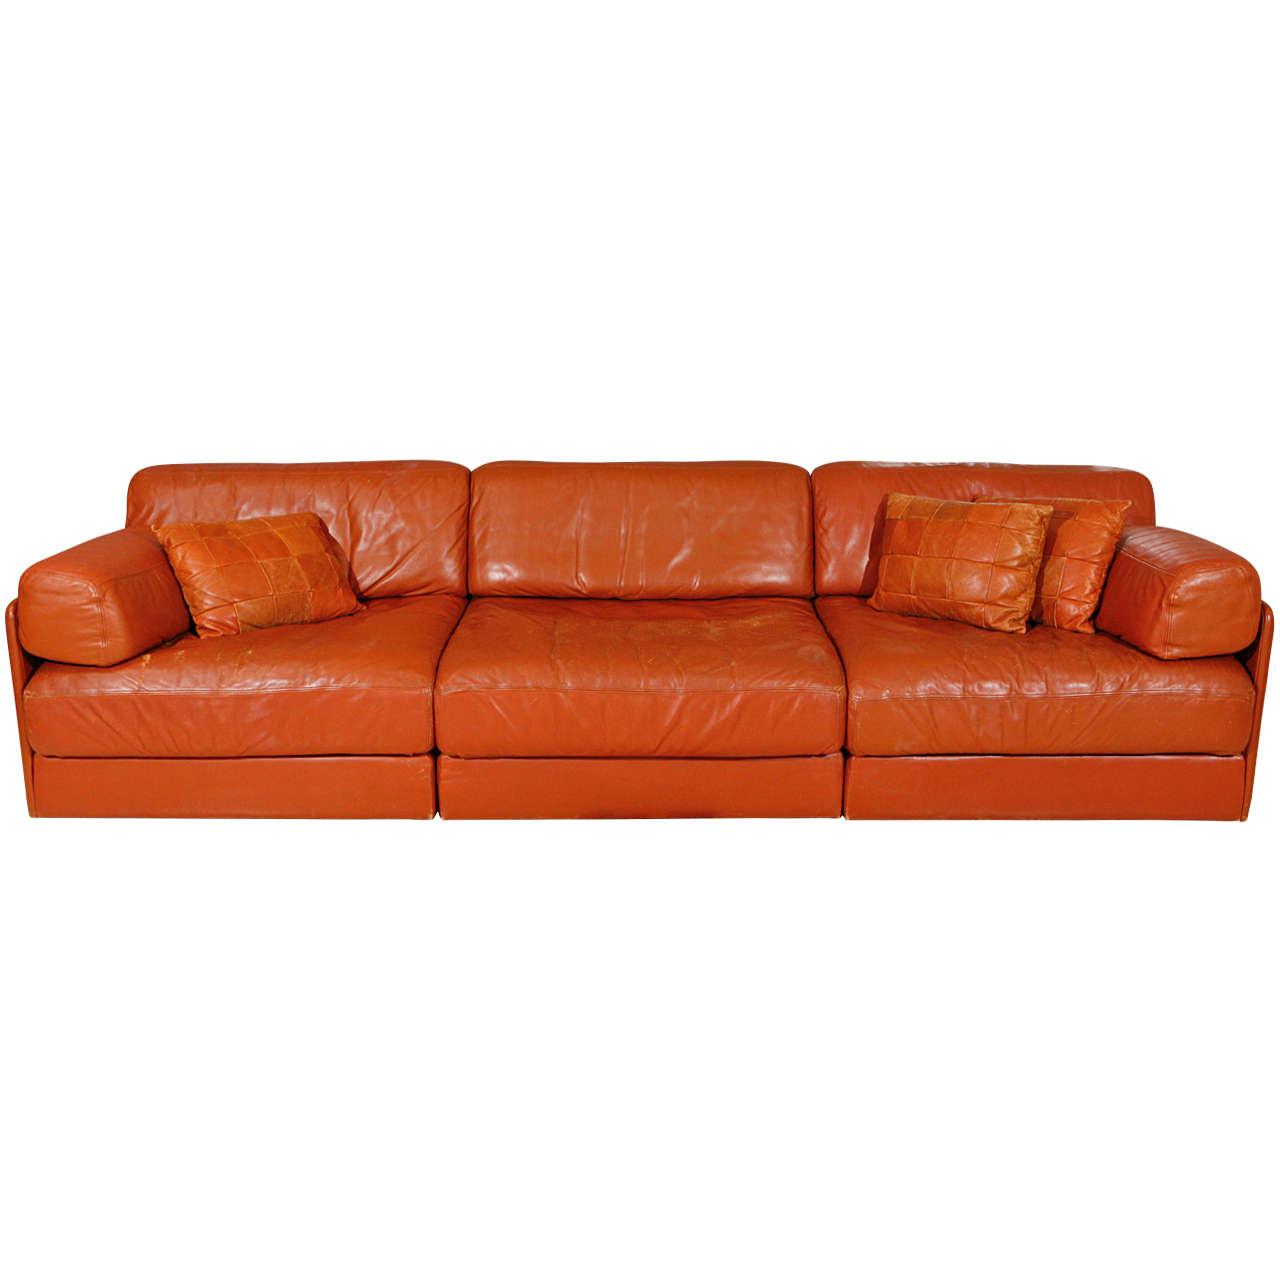 Modular Leather Sleeper Sofa By De Sede At 1stdibs